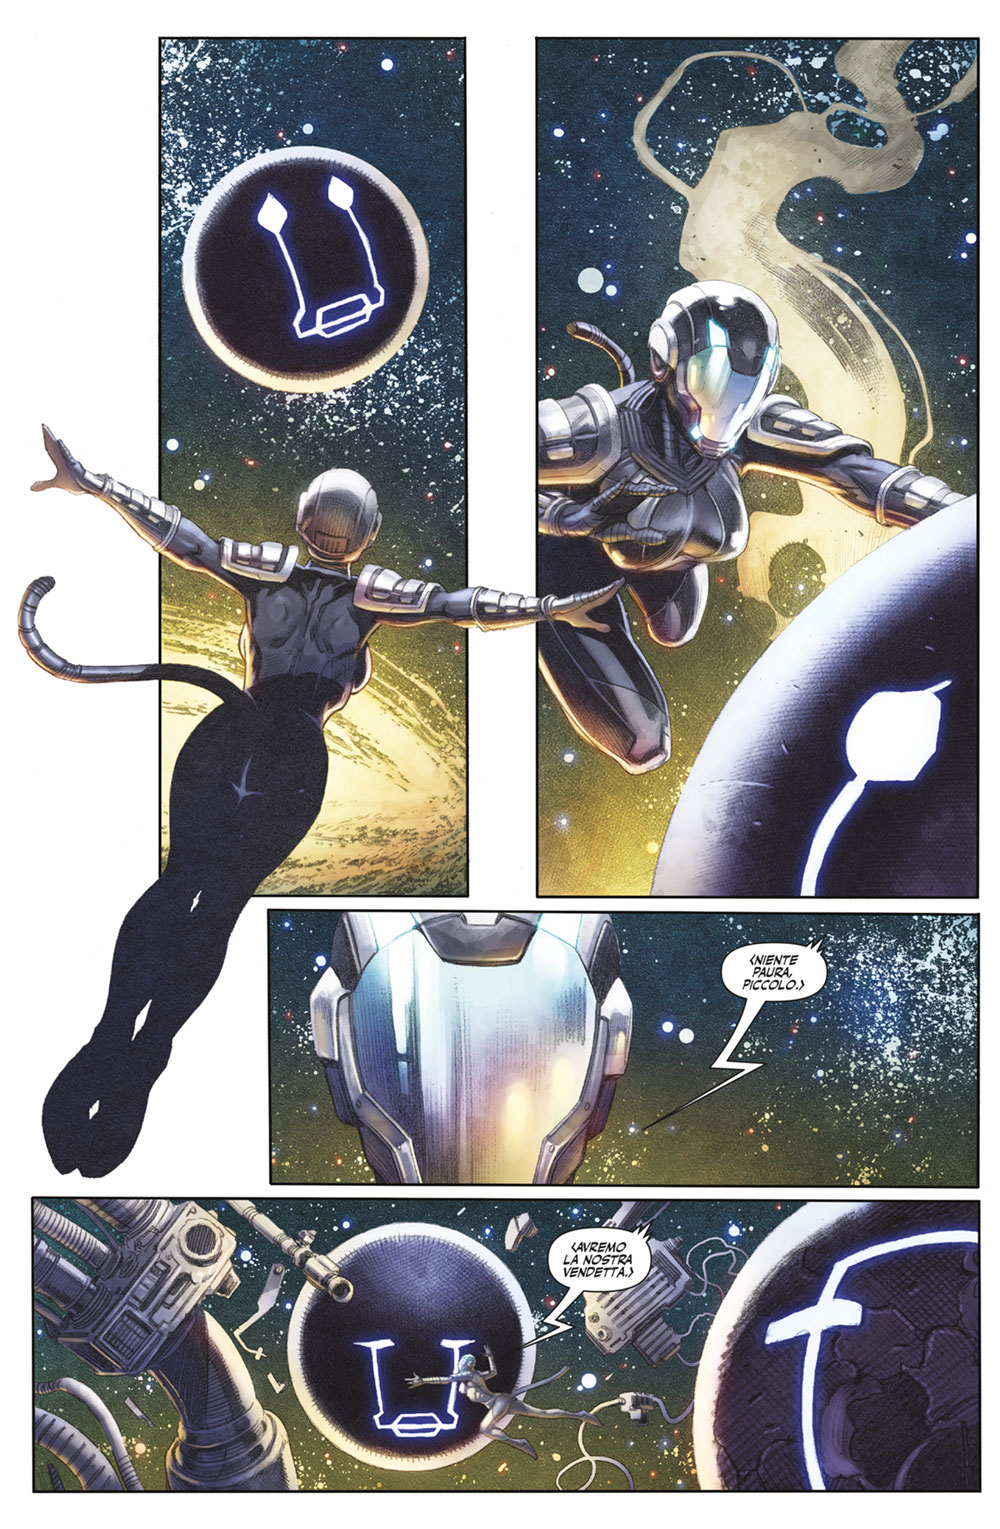 X-O Manowar vol. 7: Eroe, anteprima 02